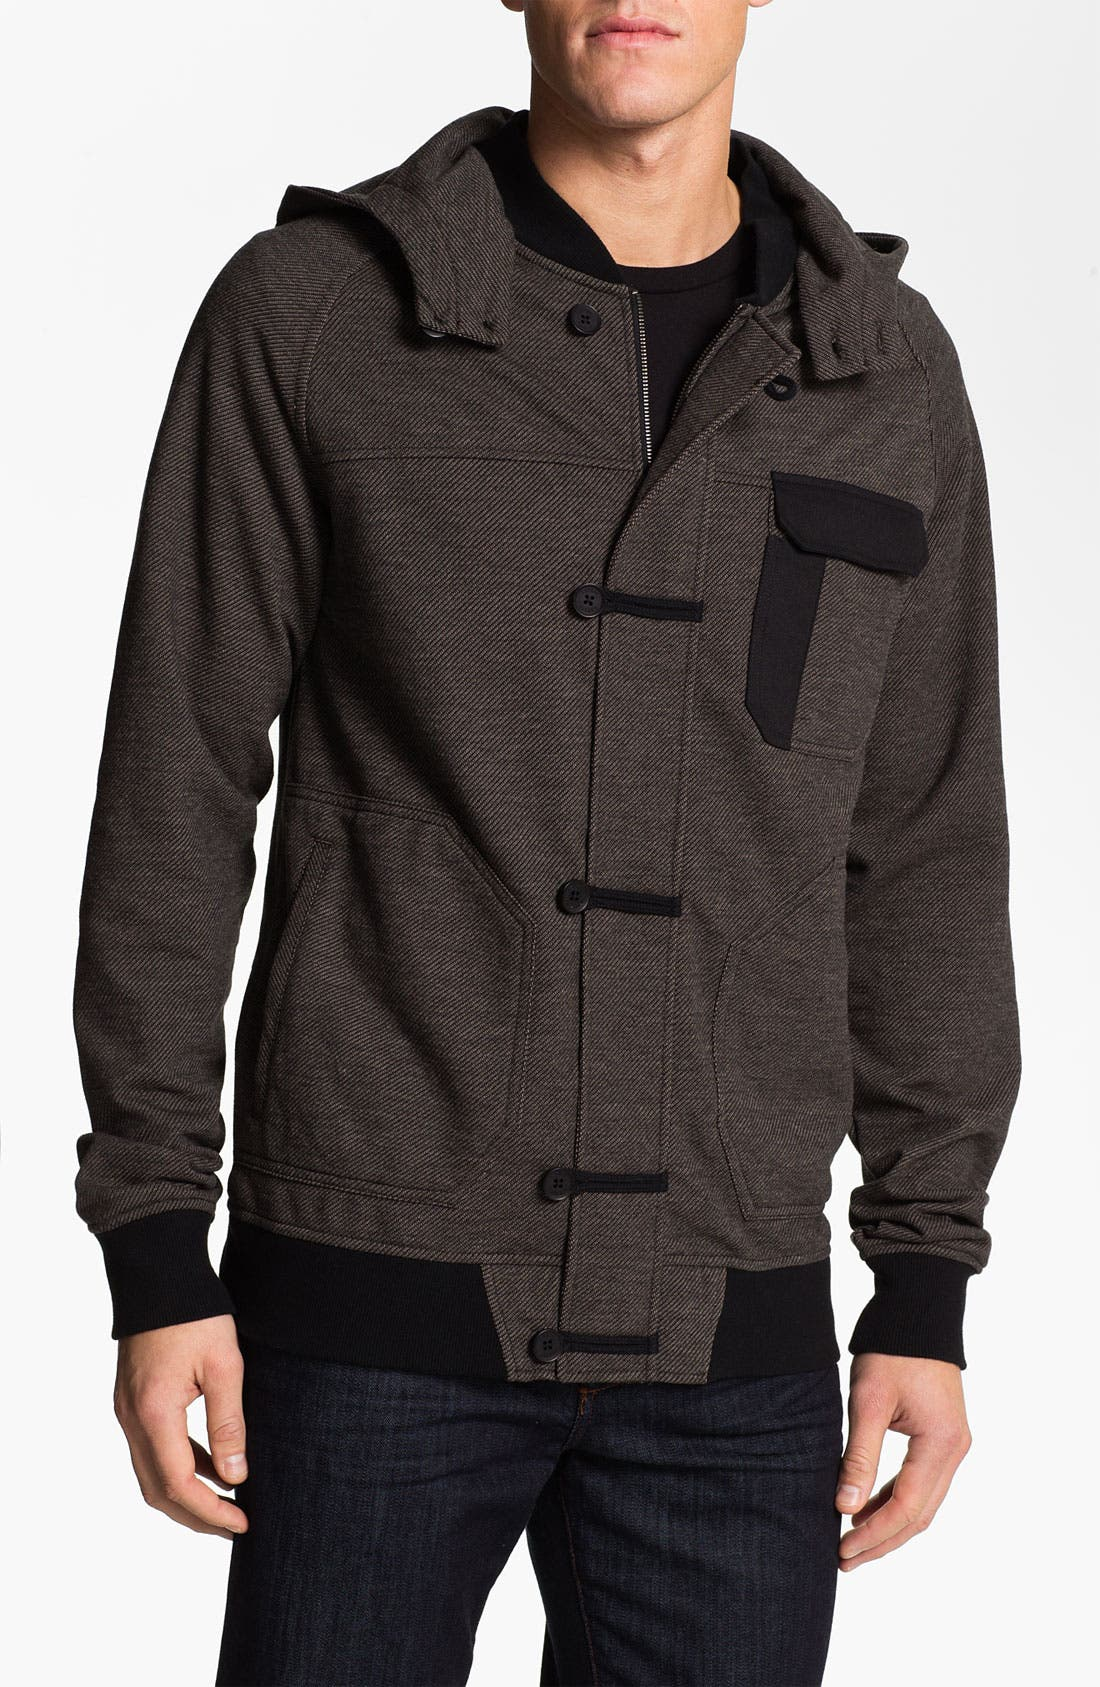 Main Image - Ezekiel 'Jaxson' Sweatshirt Jacket